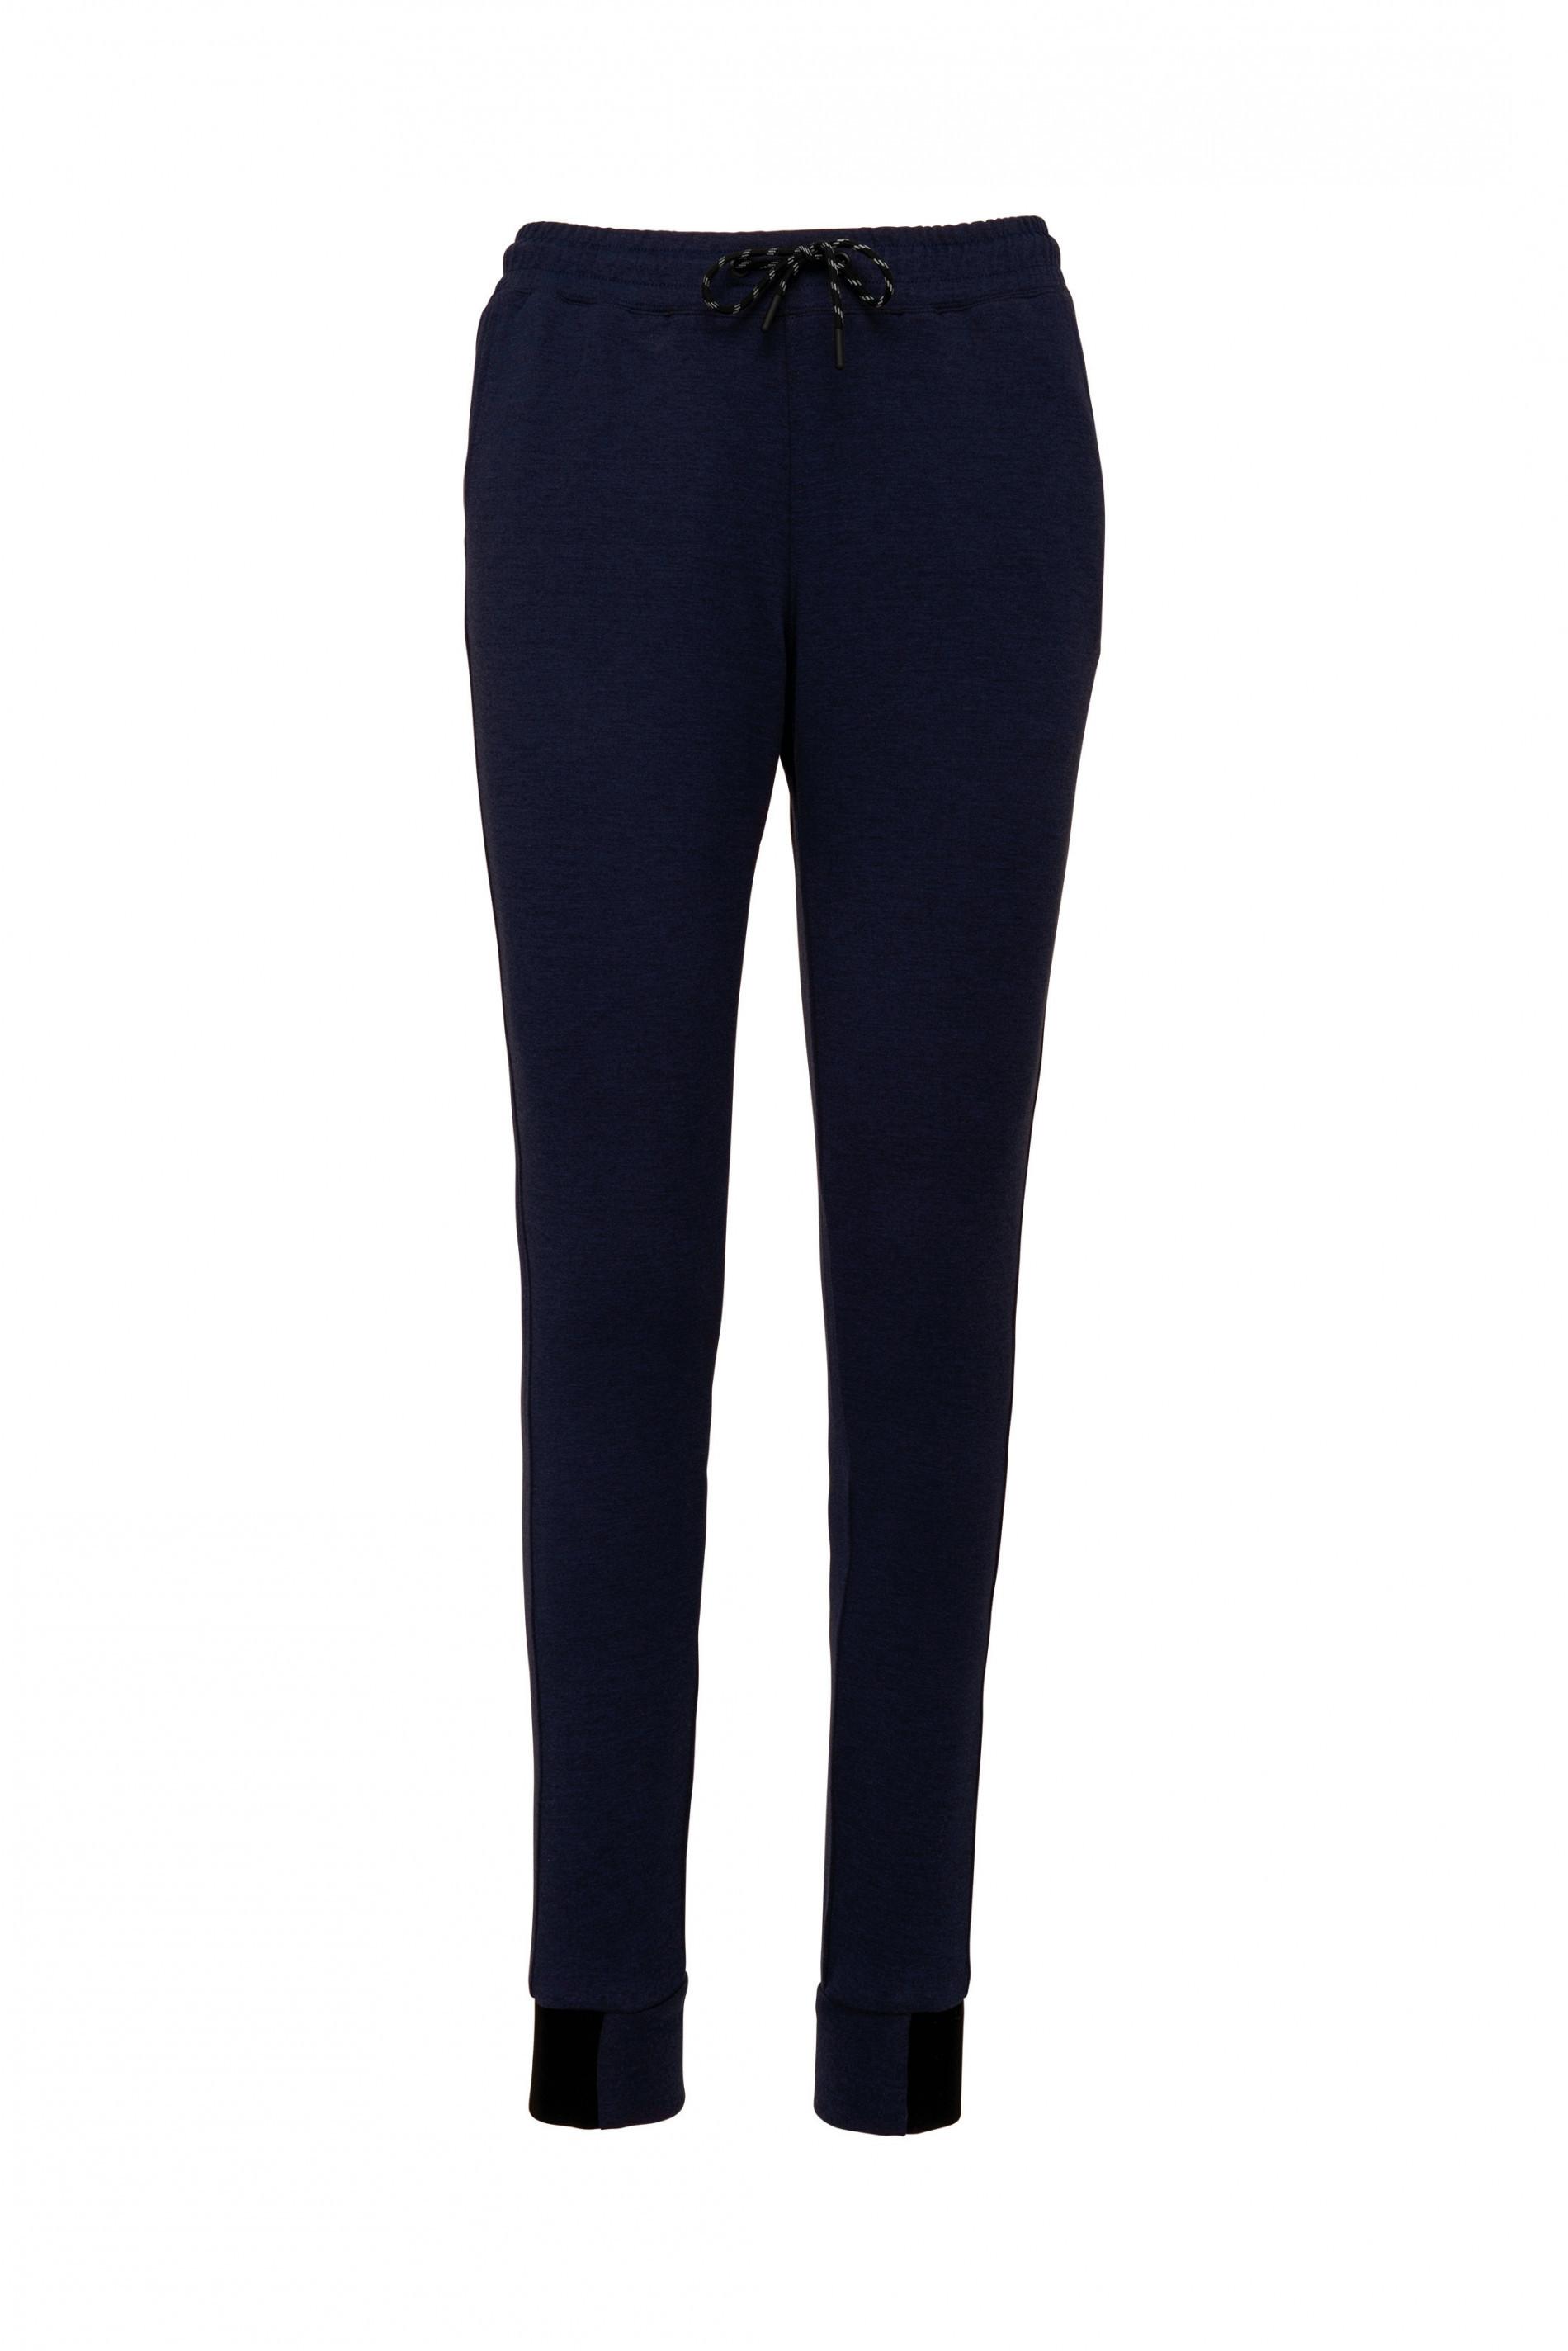 Pantalon femme - 2-1653-6